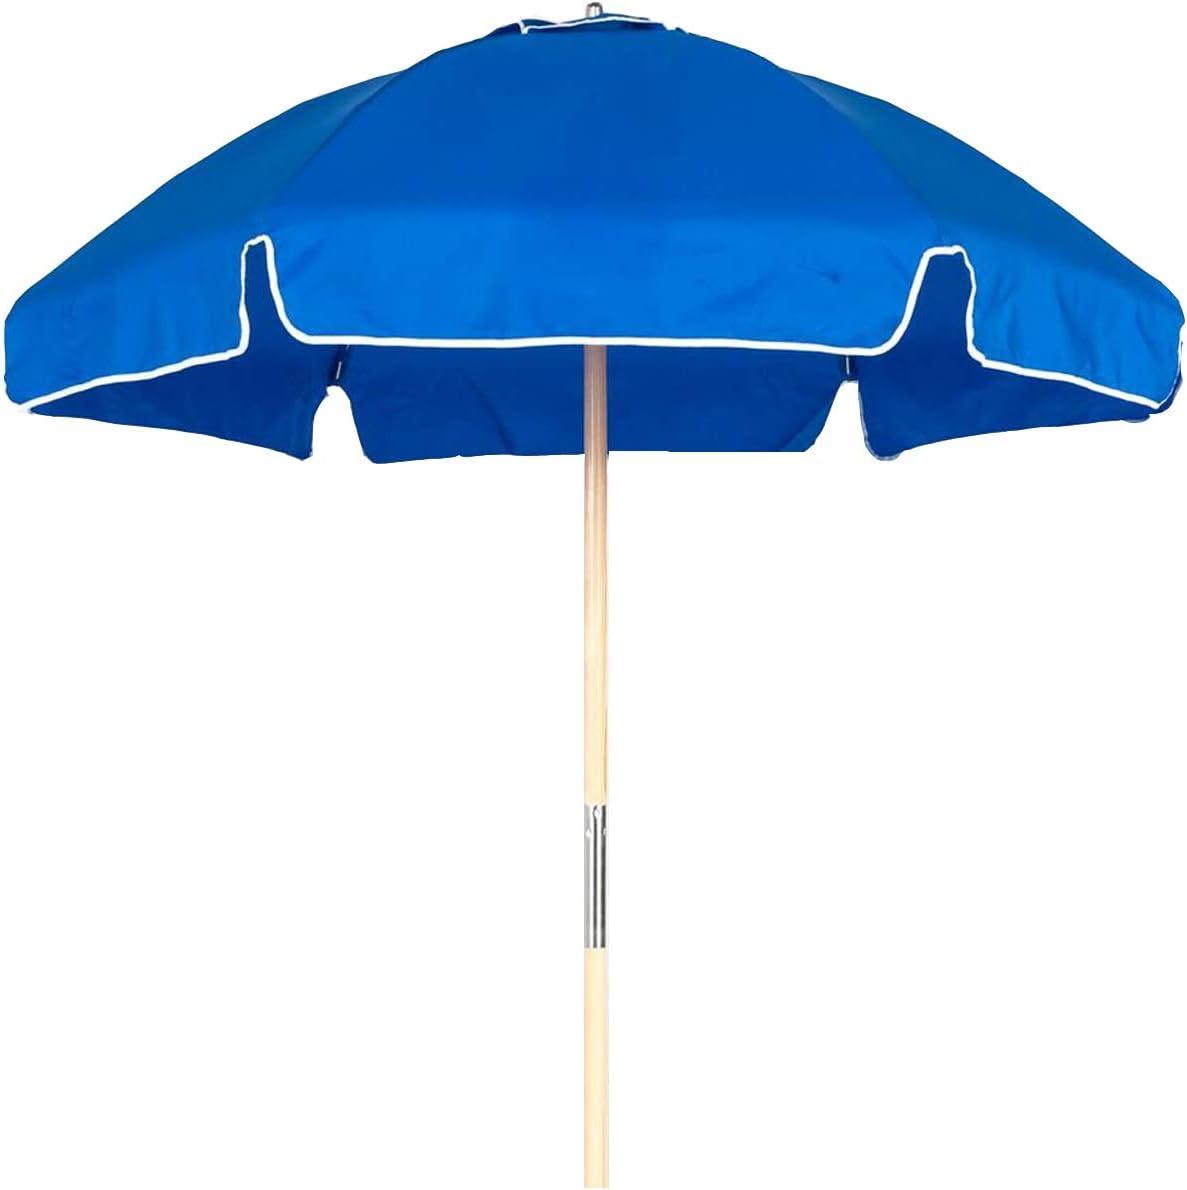 6.5 Shade Star Beach Umbrella Color Pacific Blue